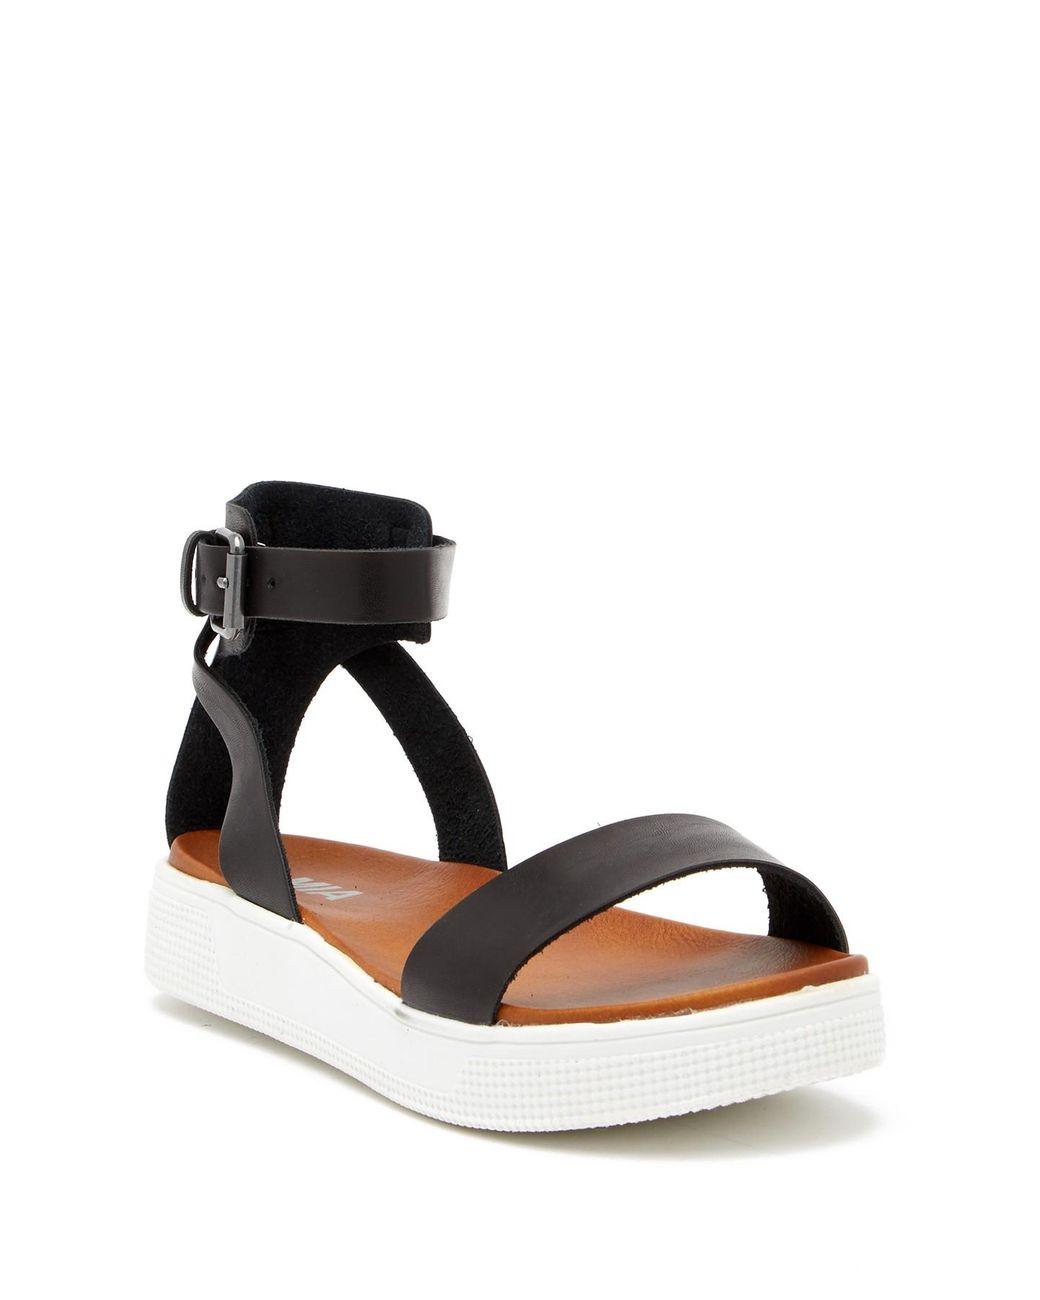 4dc49b8fc79 Lyst - MIA Platform Sandal (women) in Black - Save 43%